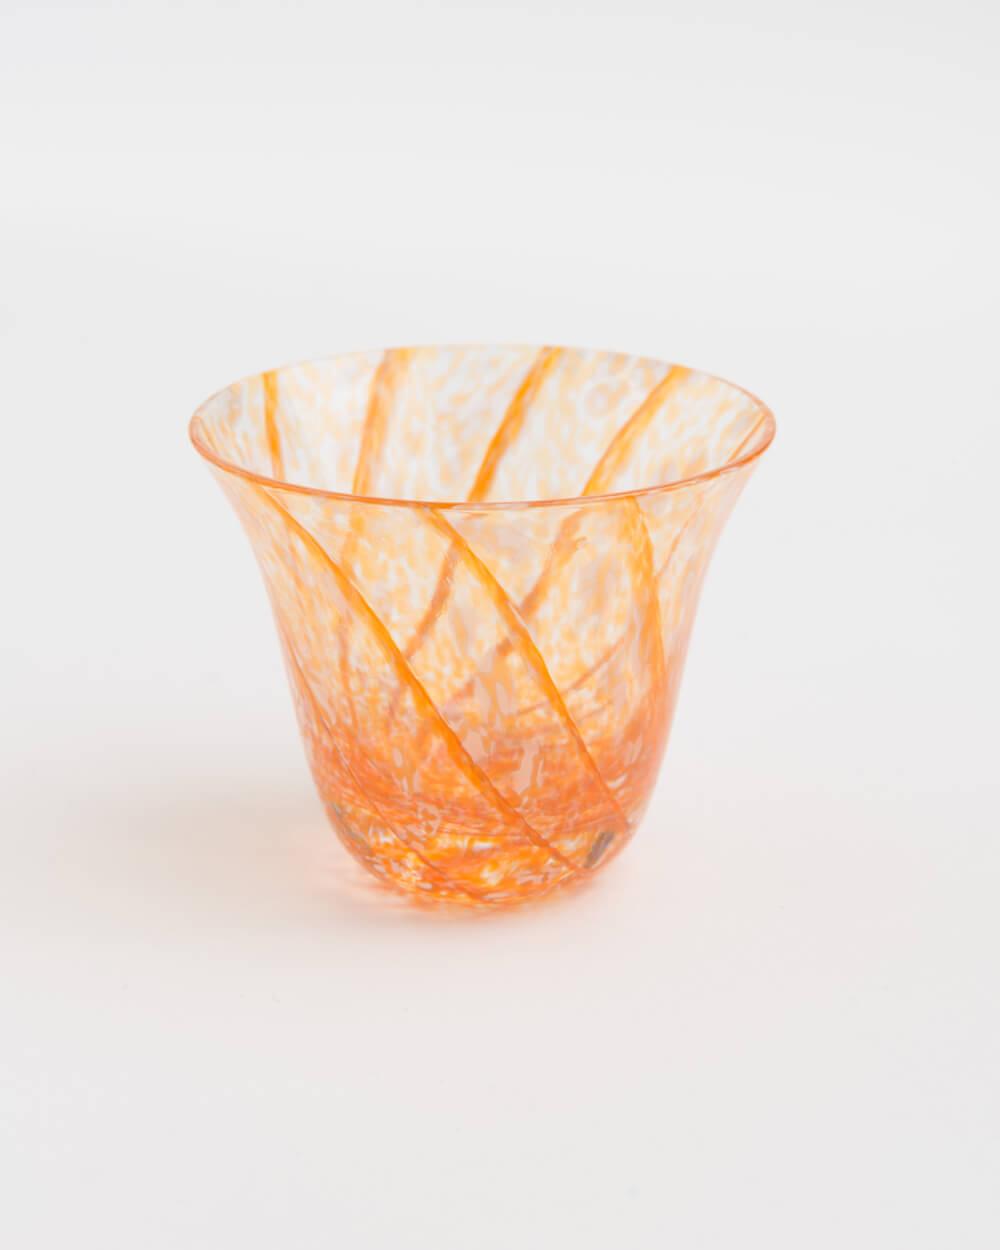 Hand-Made Valencia Orange